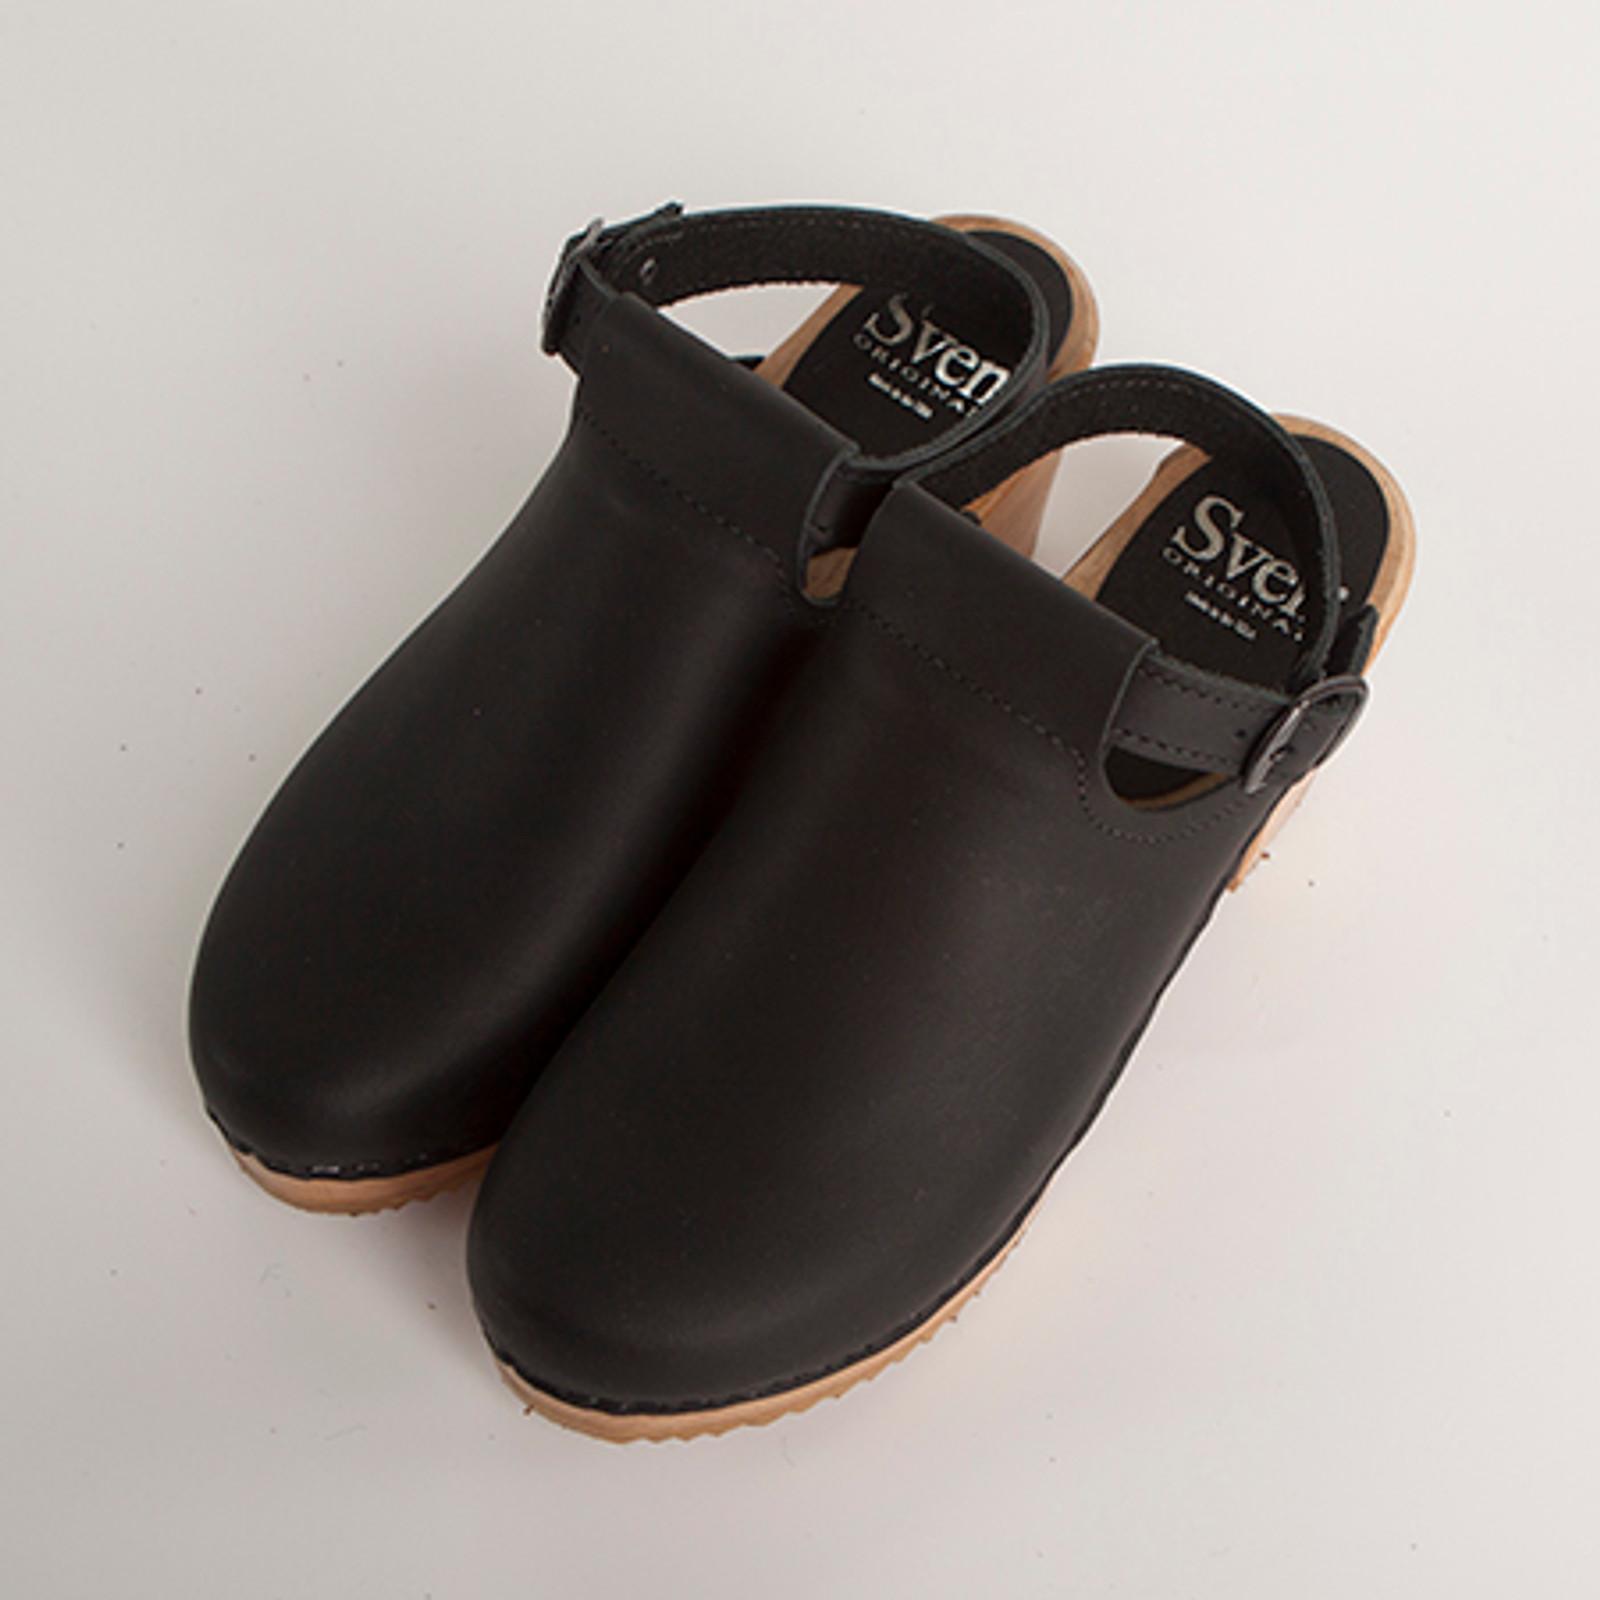 Halter Top Clogs - Closed Toe - Swedish Clogs